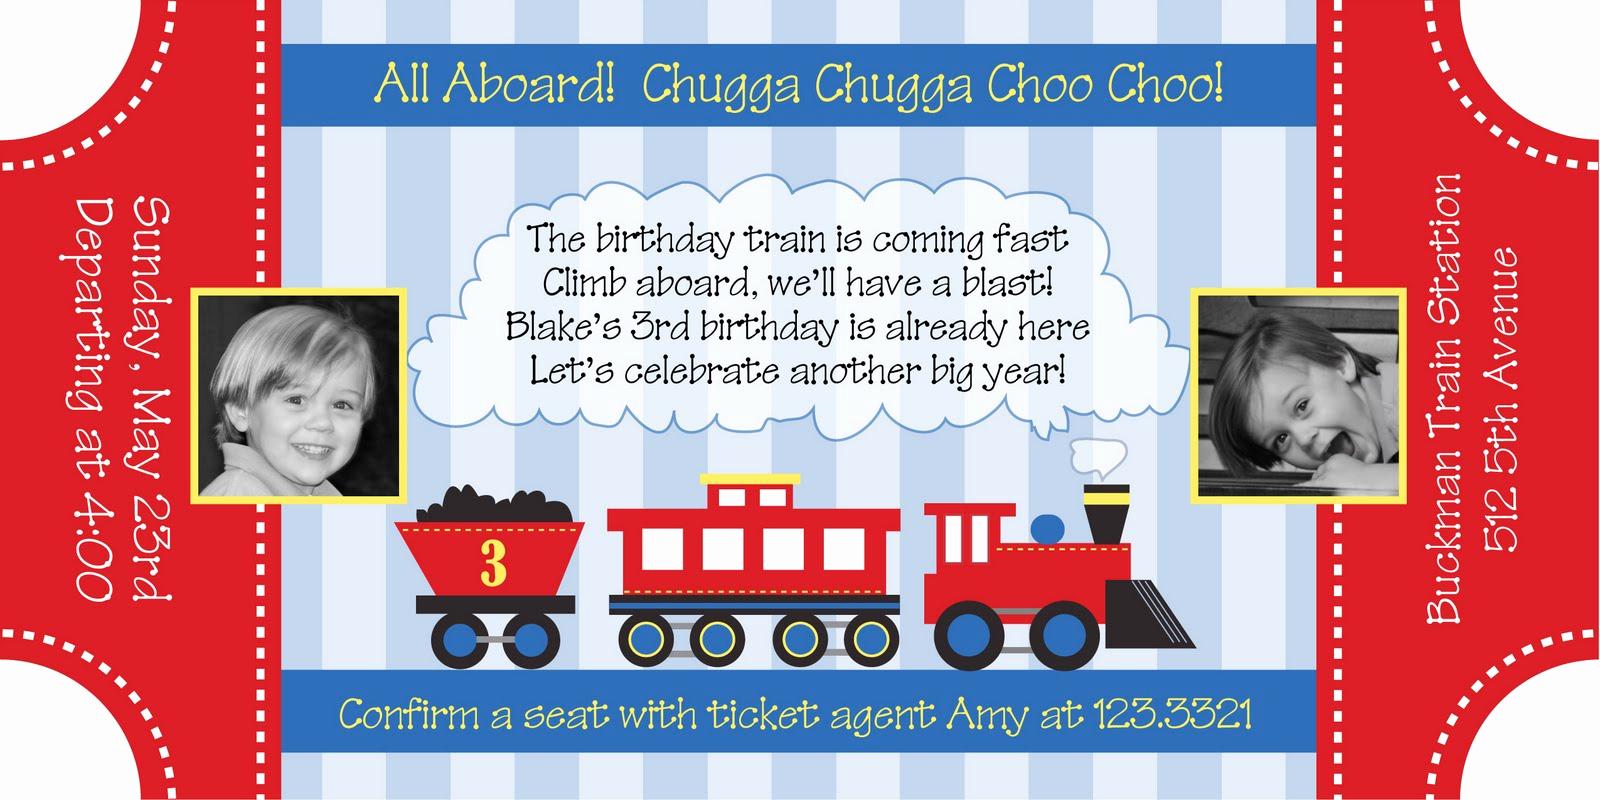 Train Ticket Birthday Invitation Beautiful All Aboard the Choo Choo Train Party anders Ruff Custom